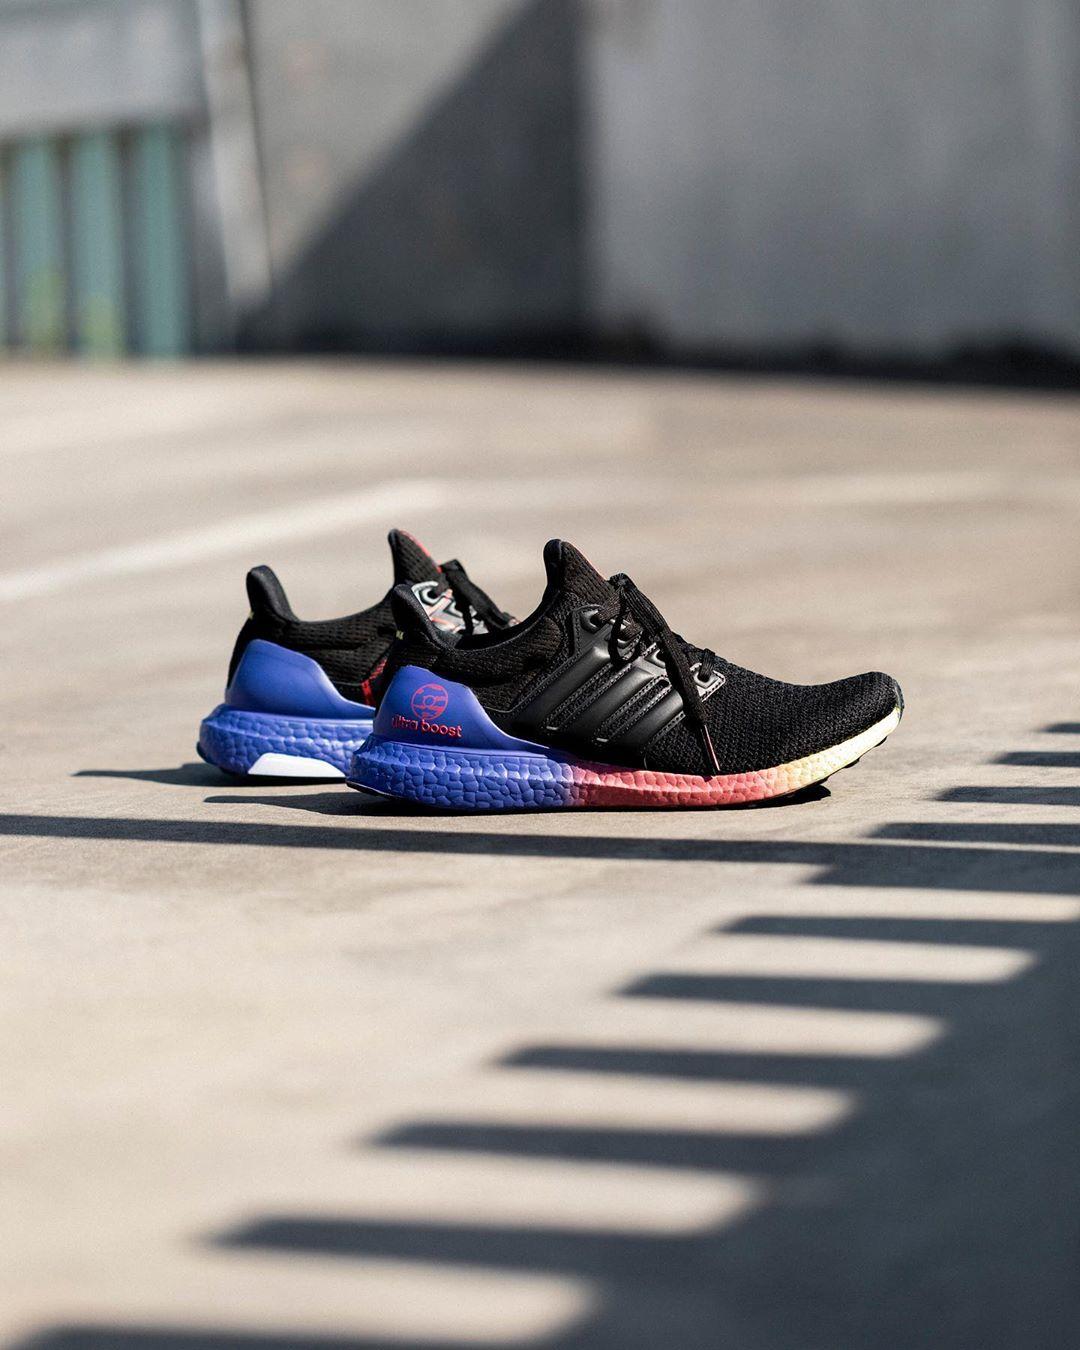 Taobao 11.11 Sale 2019 Adidas Ultraboost new city series